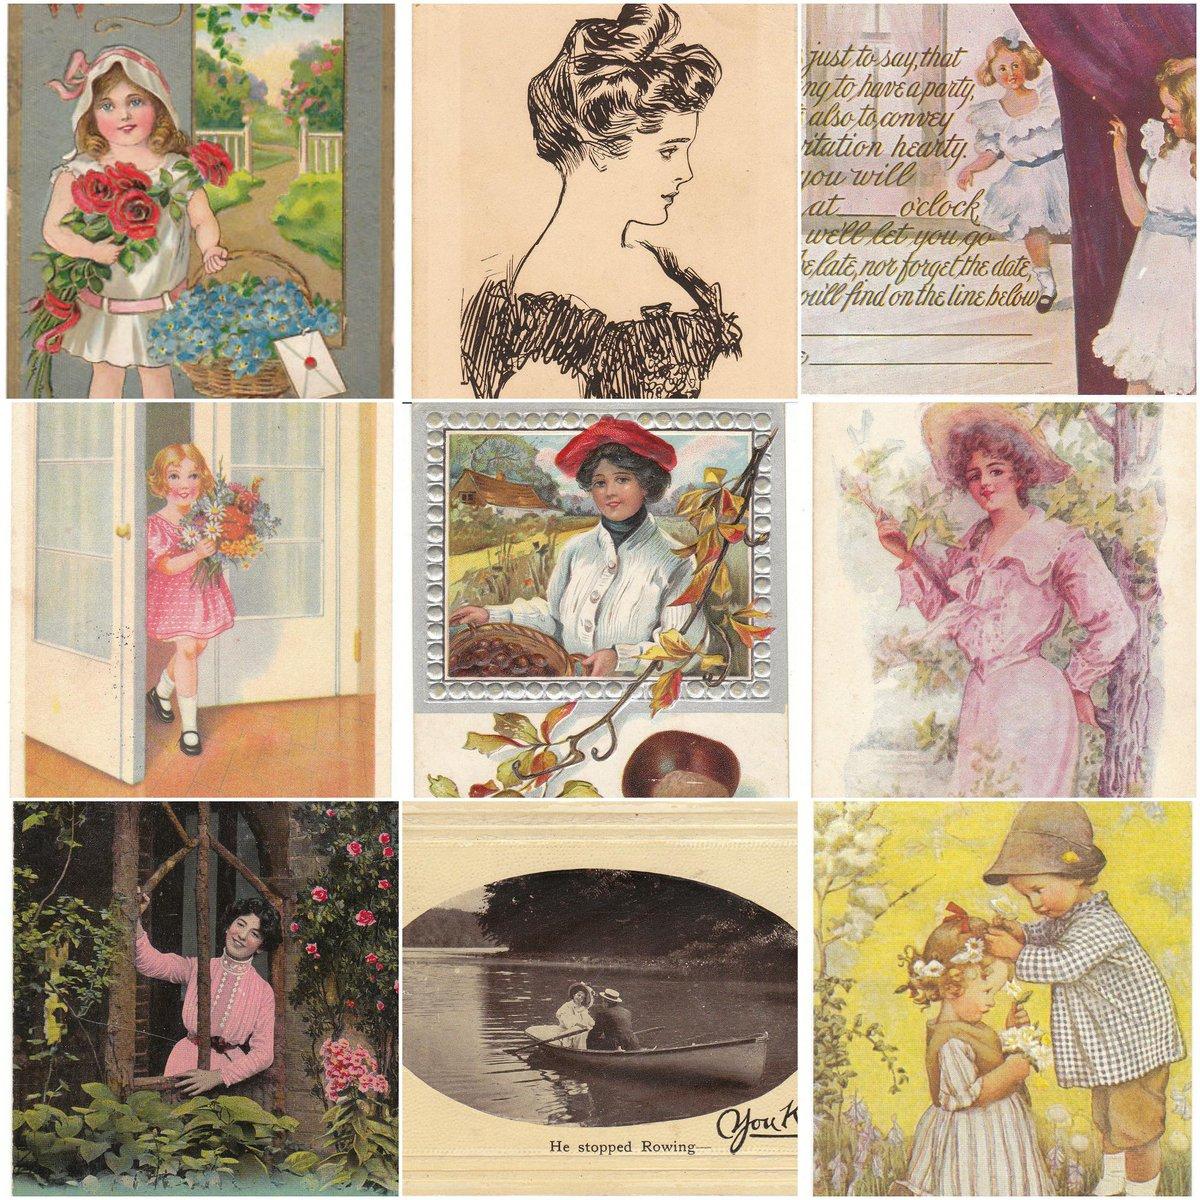 Fabulous #vintage #ephemera to frame, collect or gift: https://t.co/jUwdpvPSgH   Birdhouse Books on #eBay https://t.co/999DhacPsf